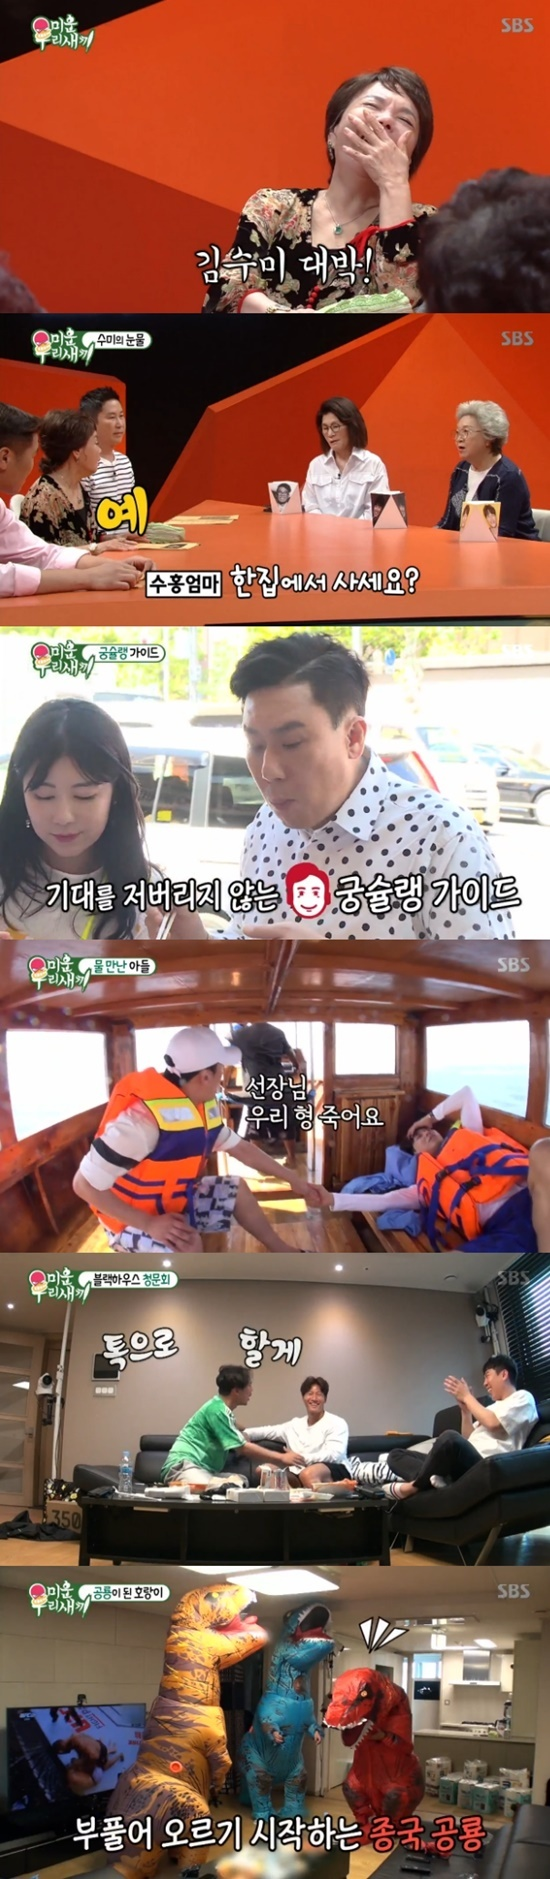 SBS '미운 우리 새끼' 방송 화면 캡처 © News1